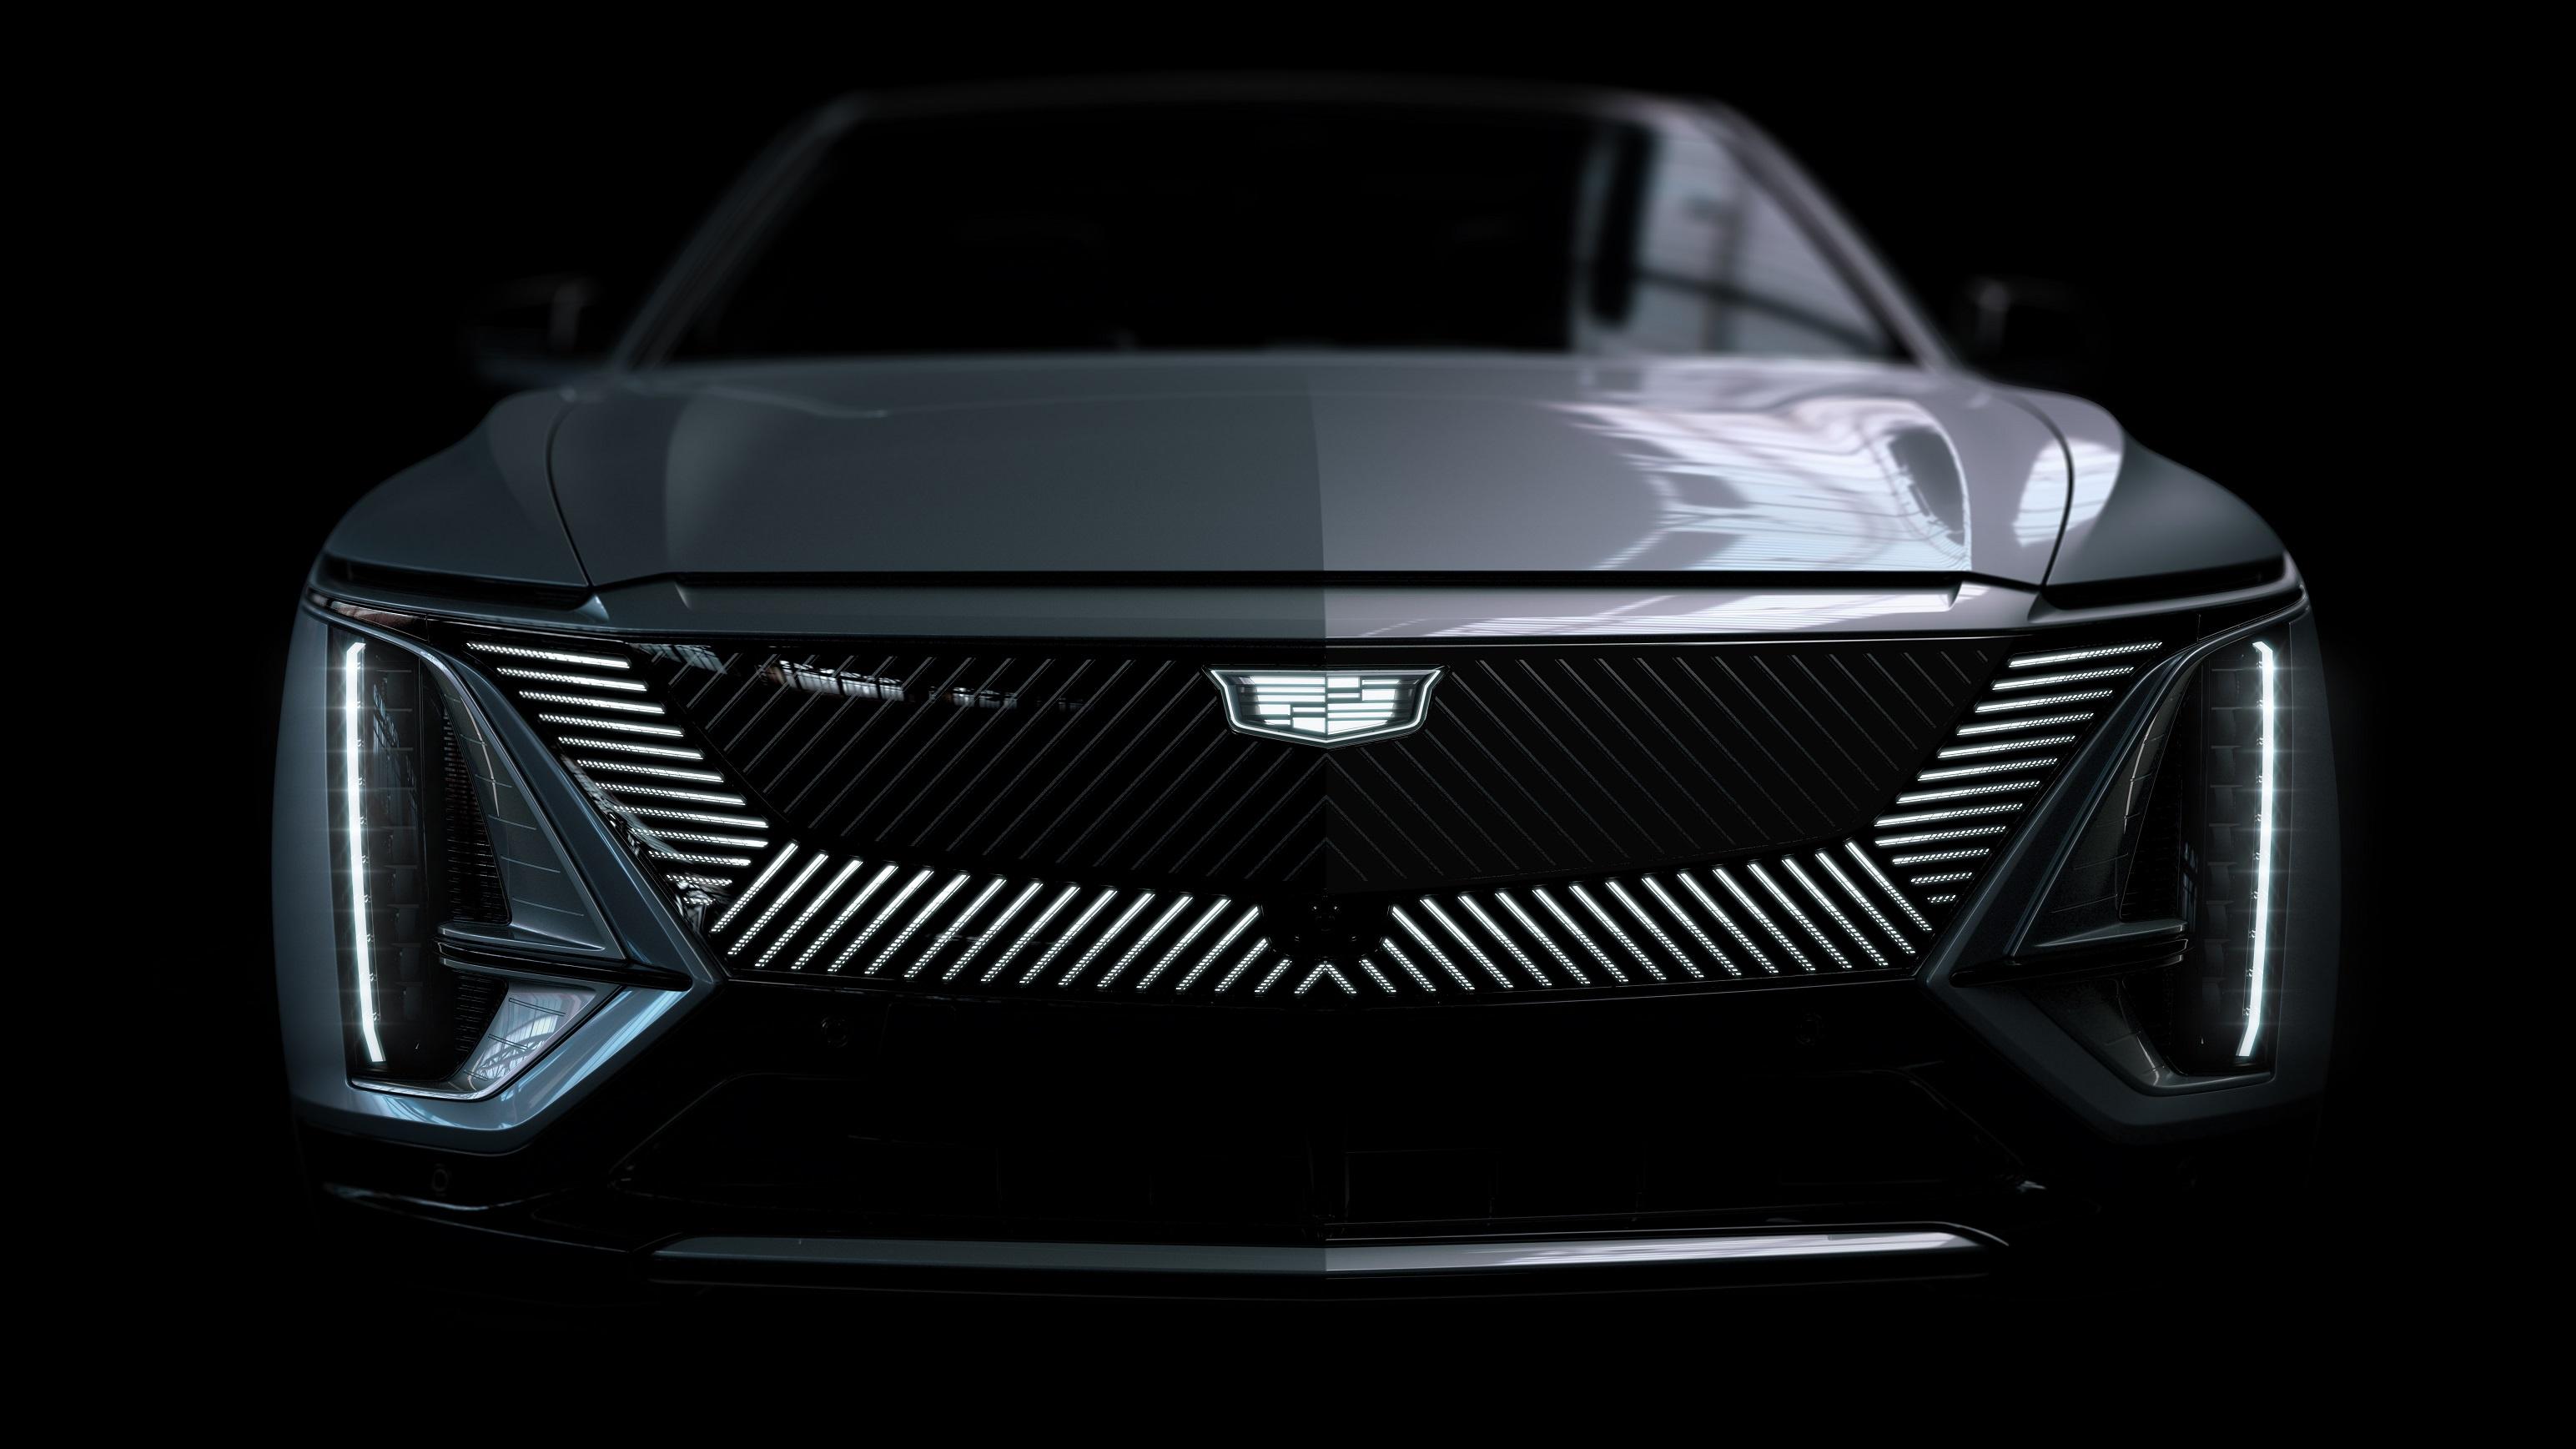 2023 Cadillac LYRIQ Debuts, Heralding an All-Electric Future